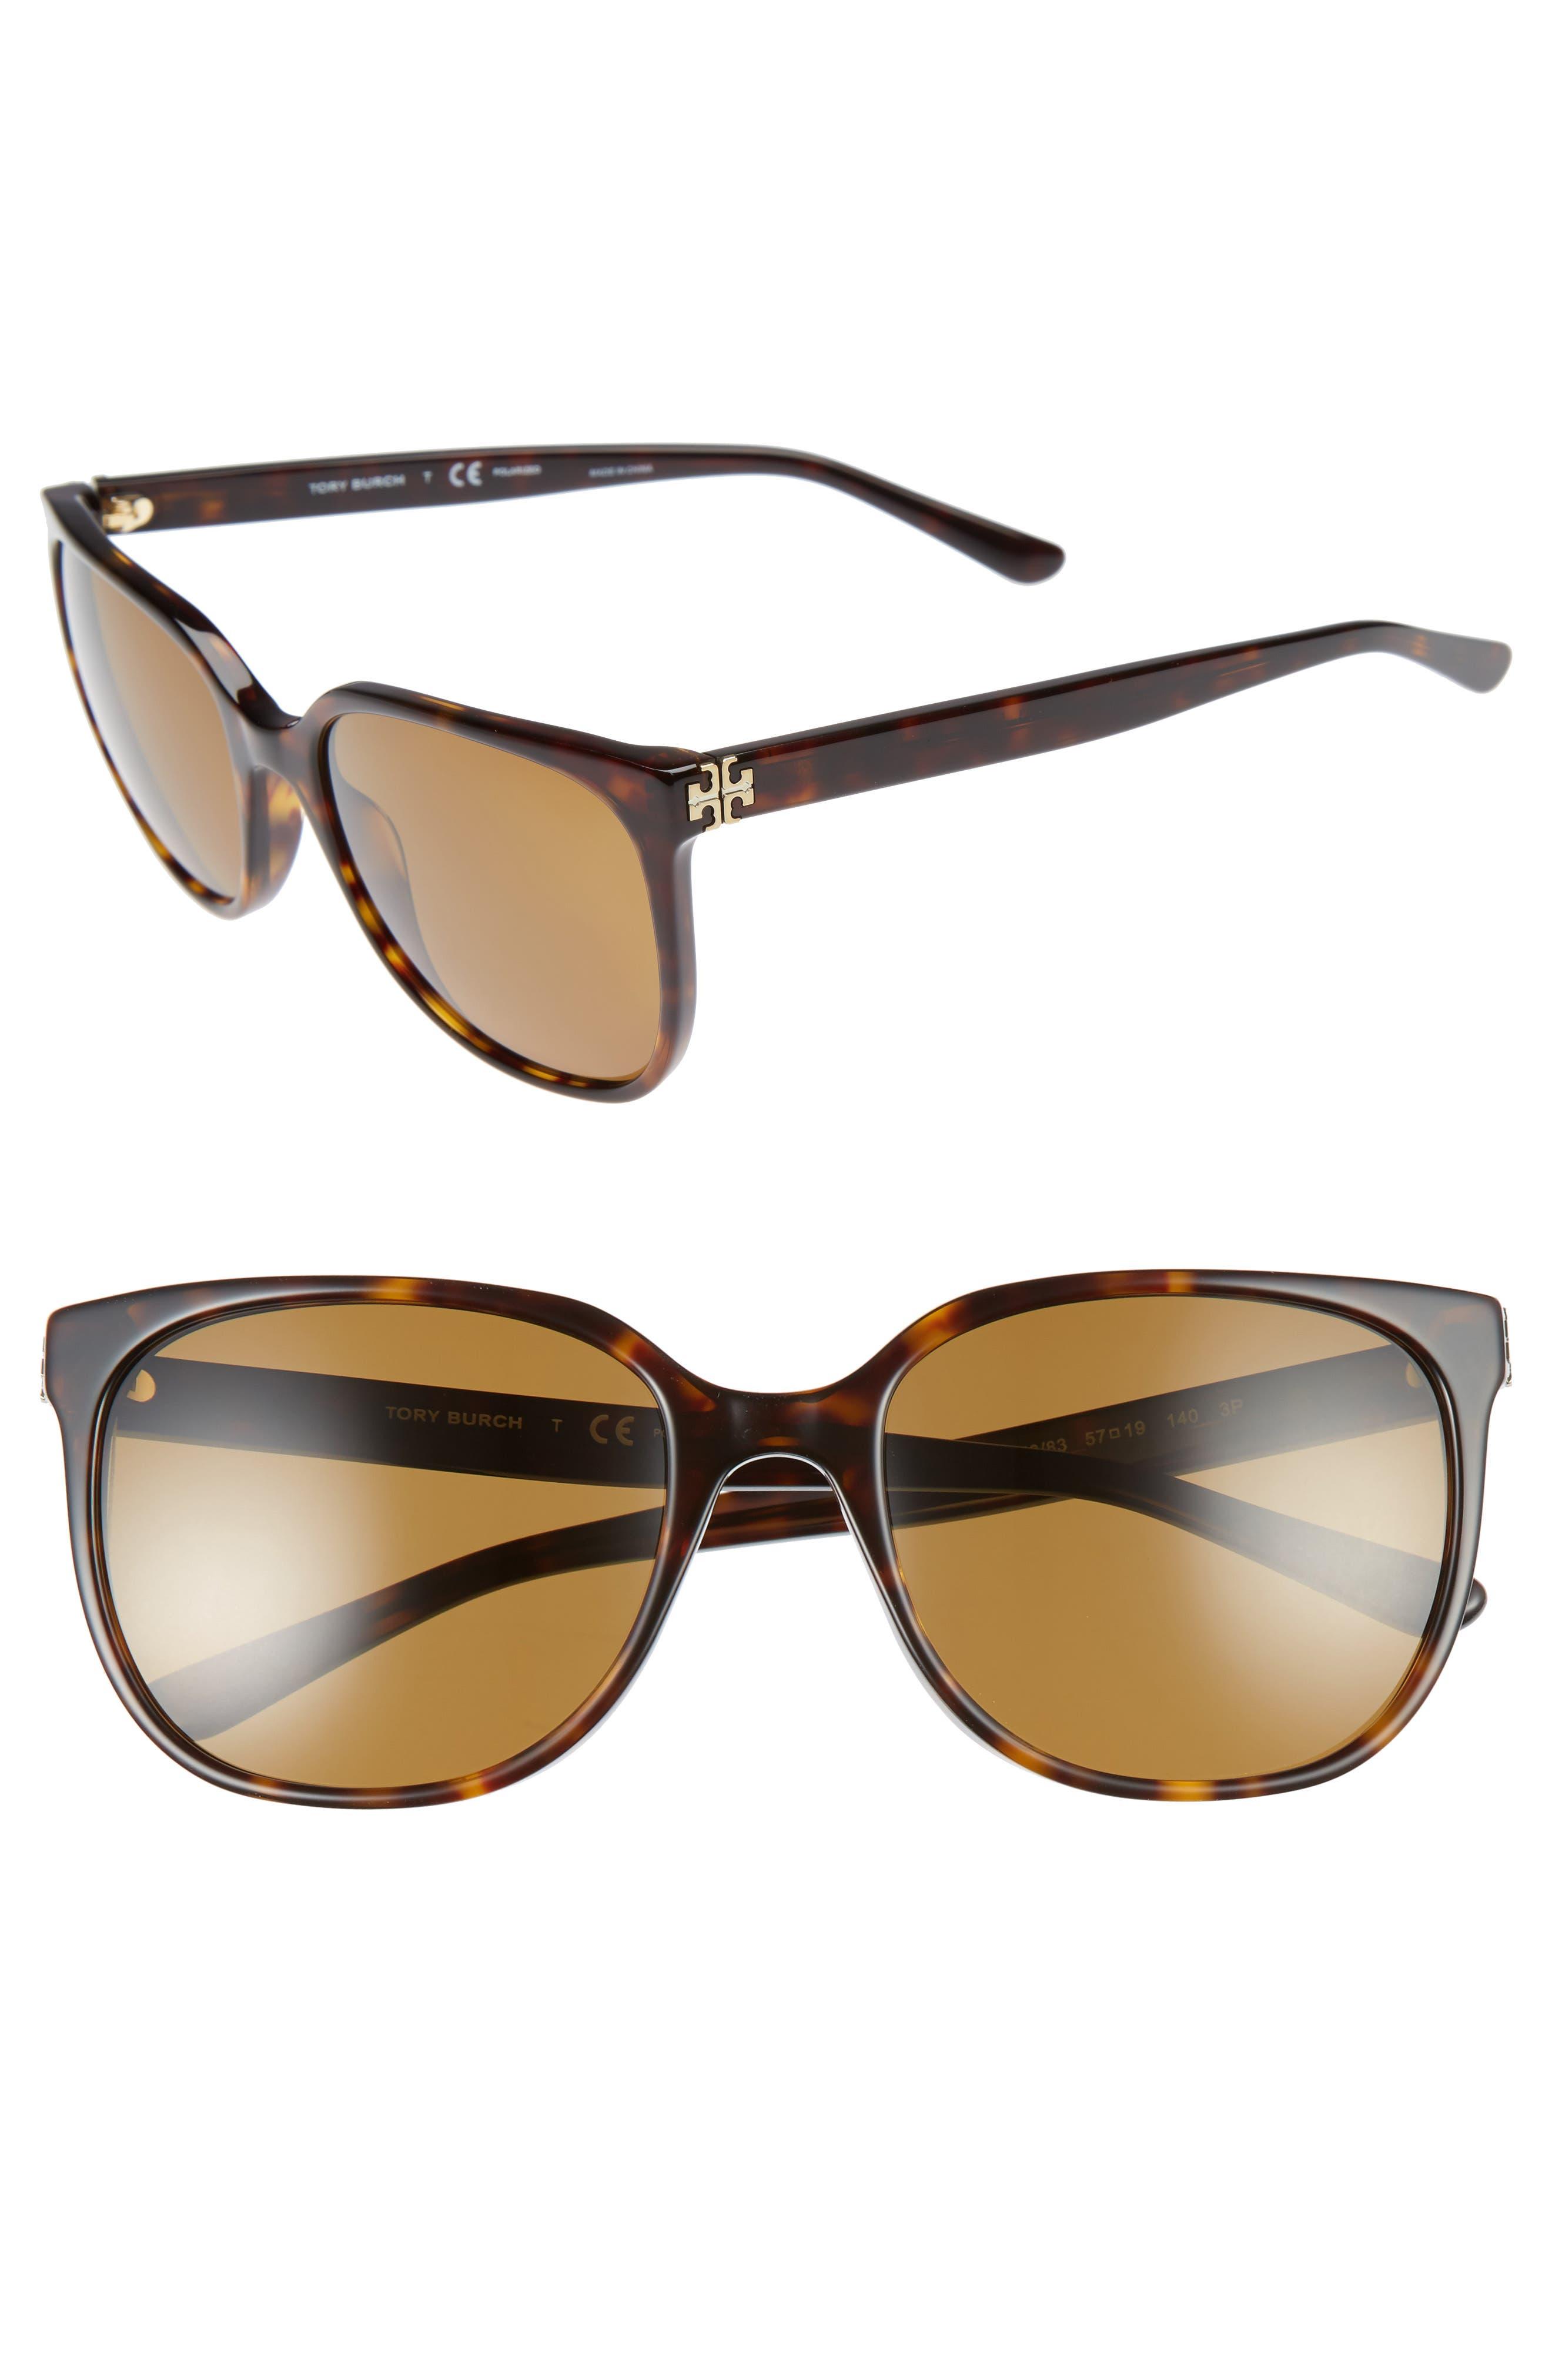 57mm Polarized Sunglasses,                             Main thumbnail 1, color,                             DARK TORTOISE